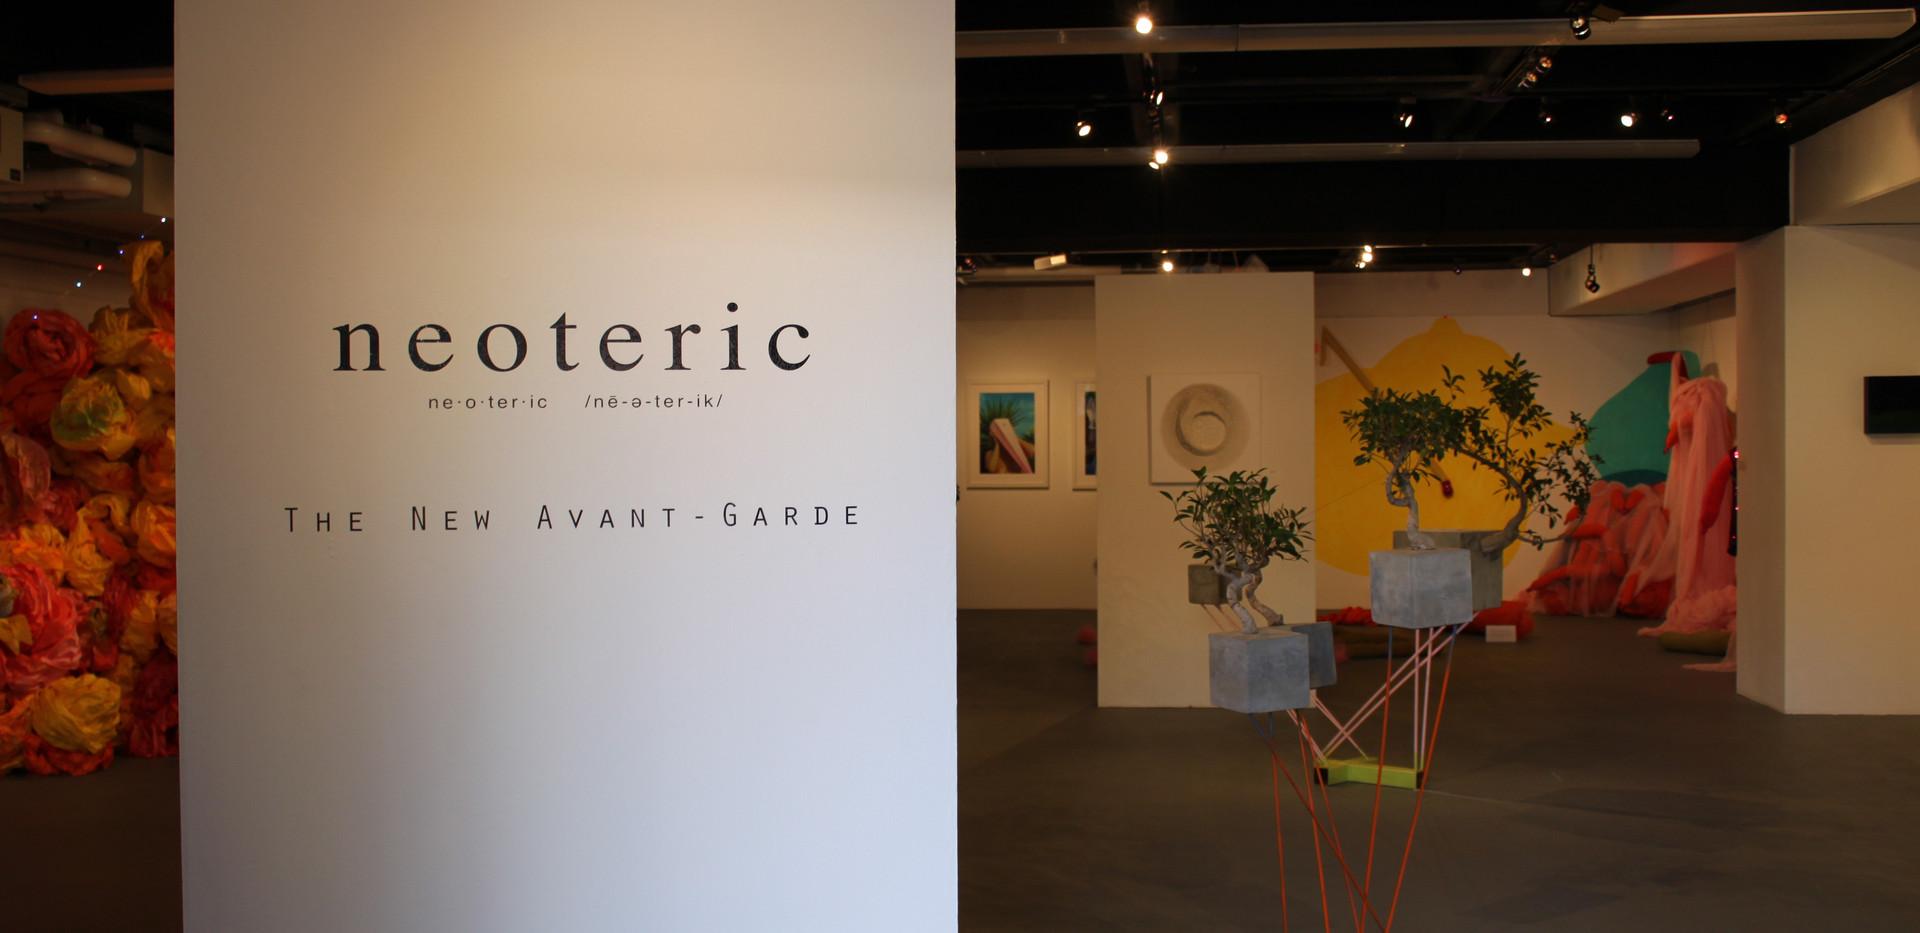 Neoteric: The New Avant-Garde